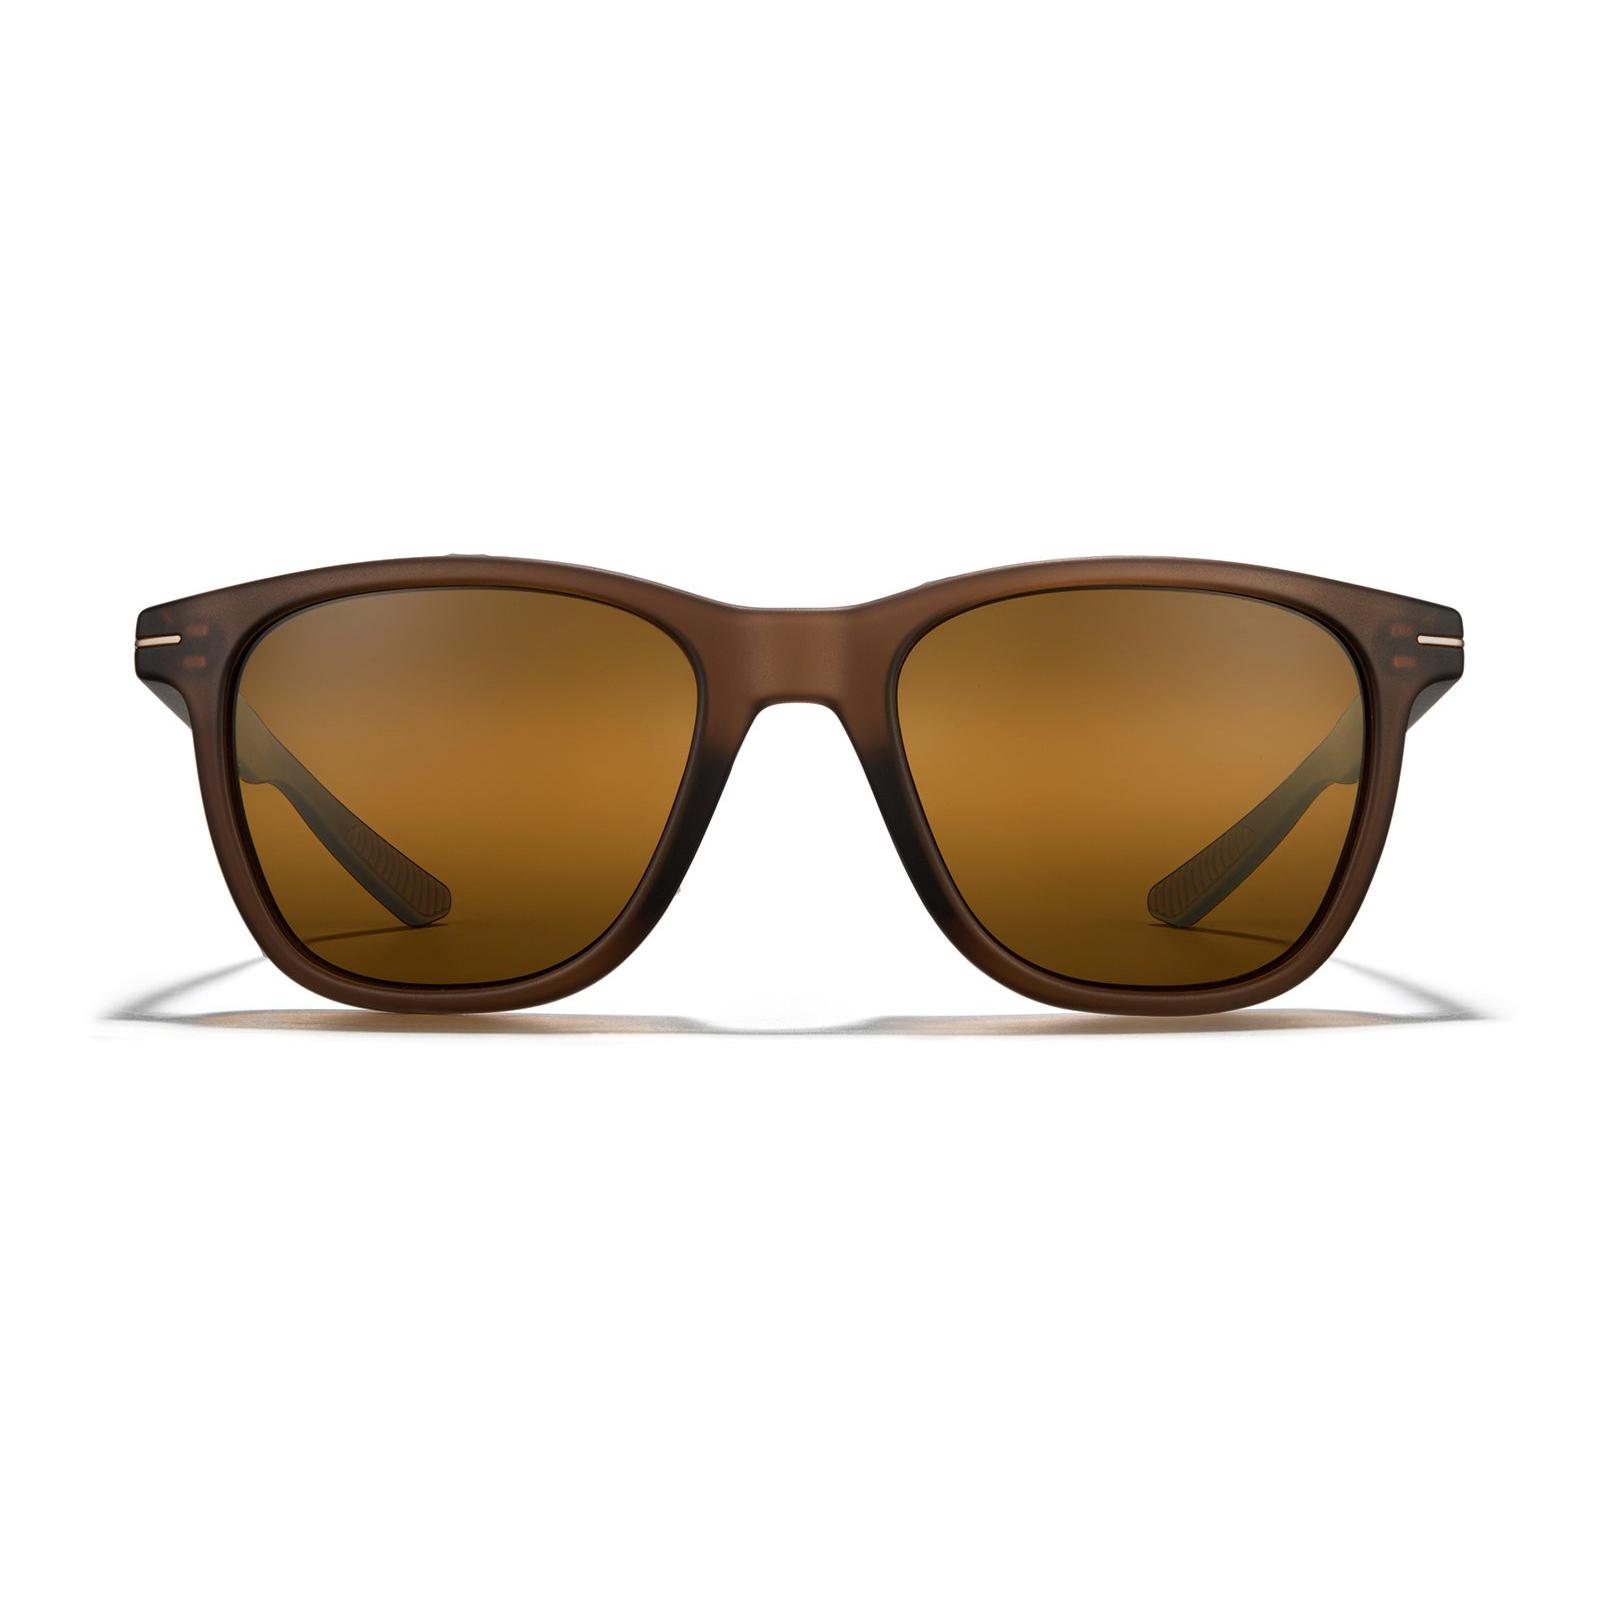 Halsey Sunglass Product Image